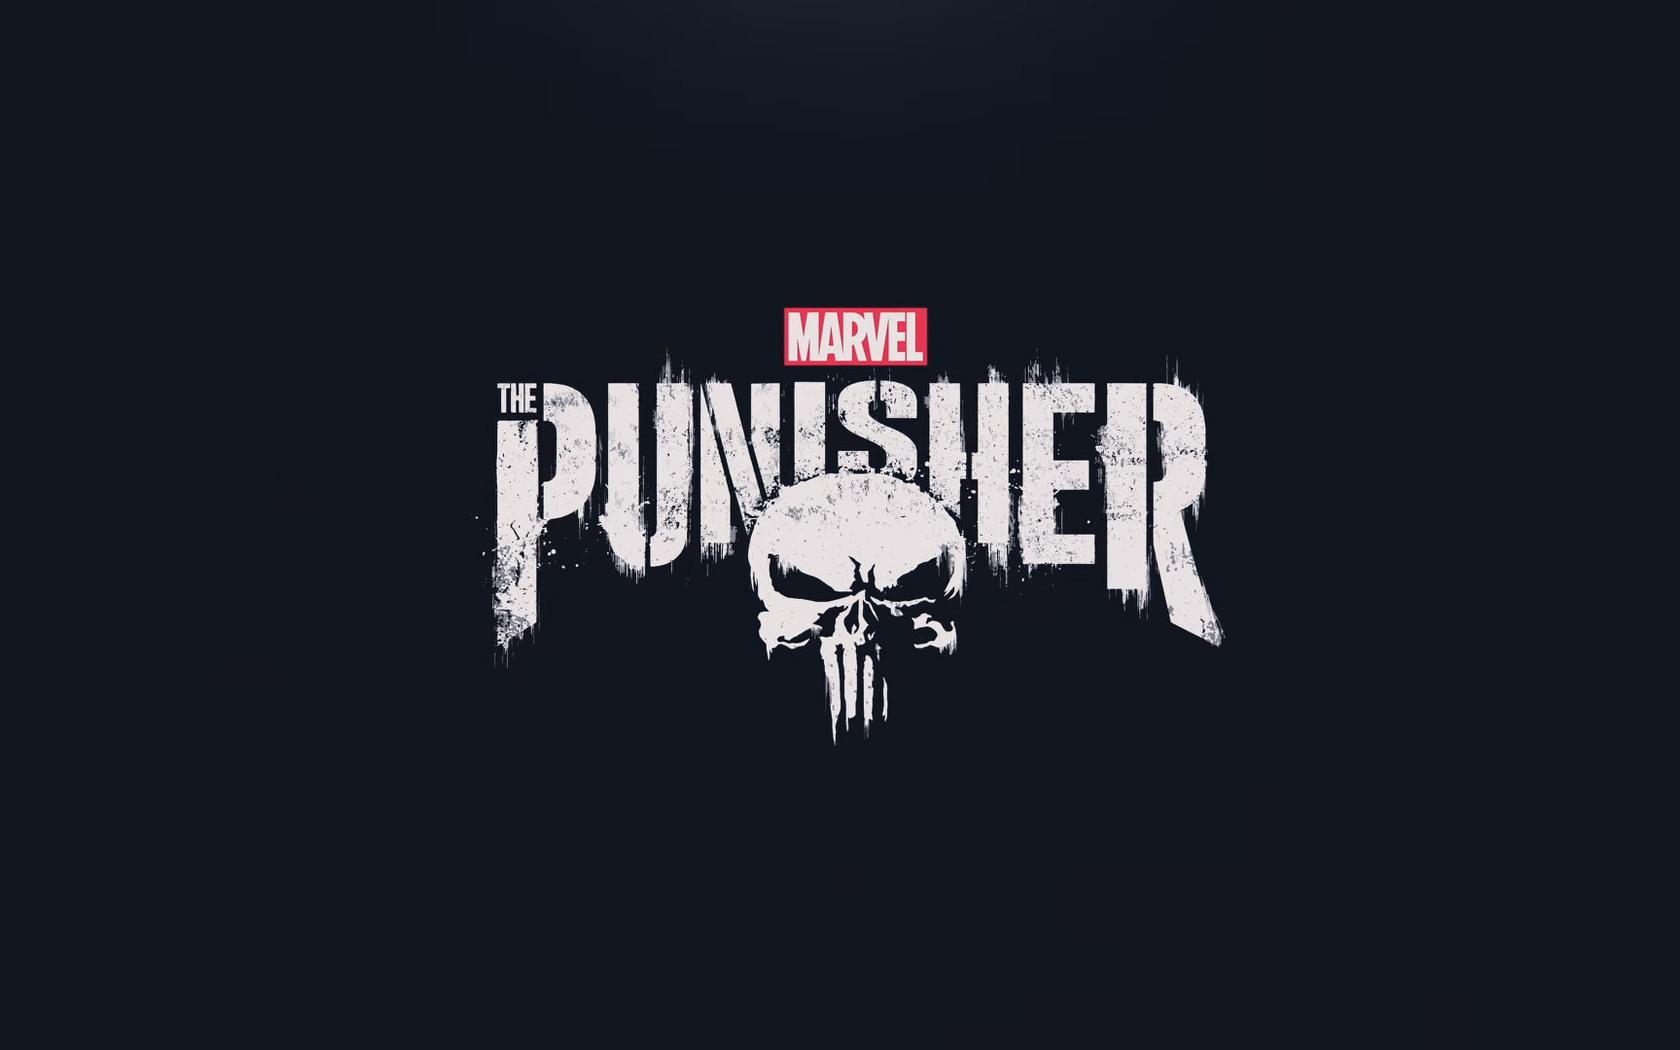 the-punisher-2017-hd-logo-4b.jpg